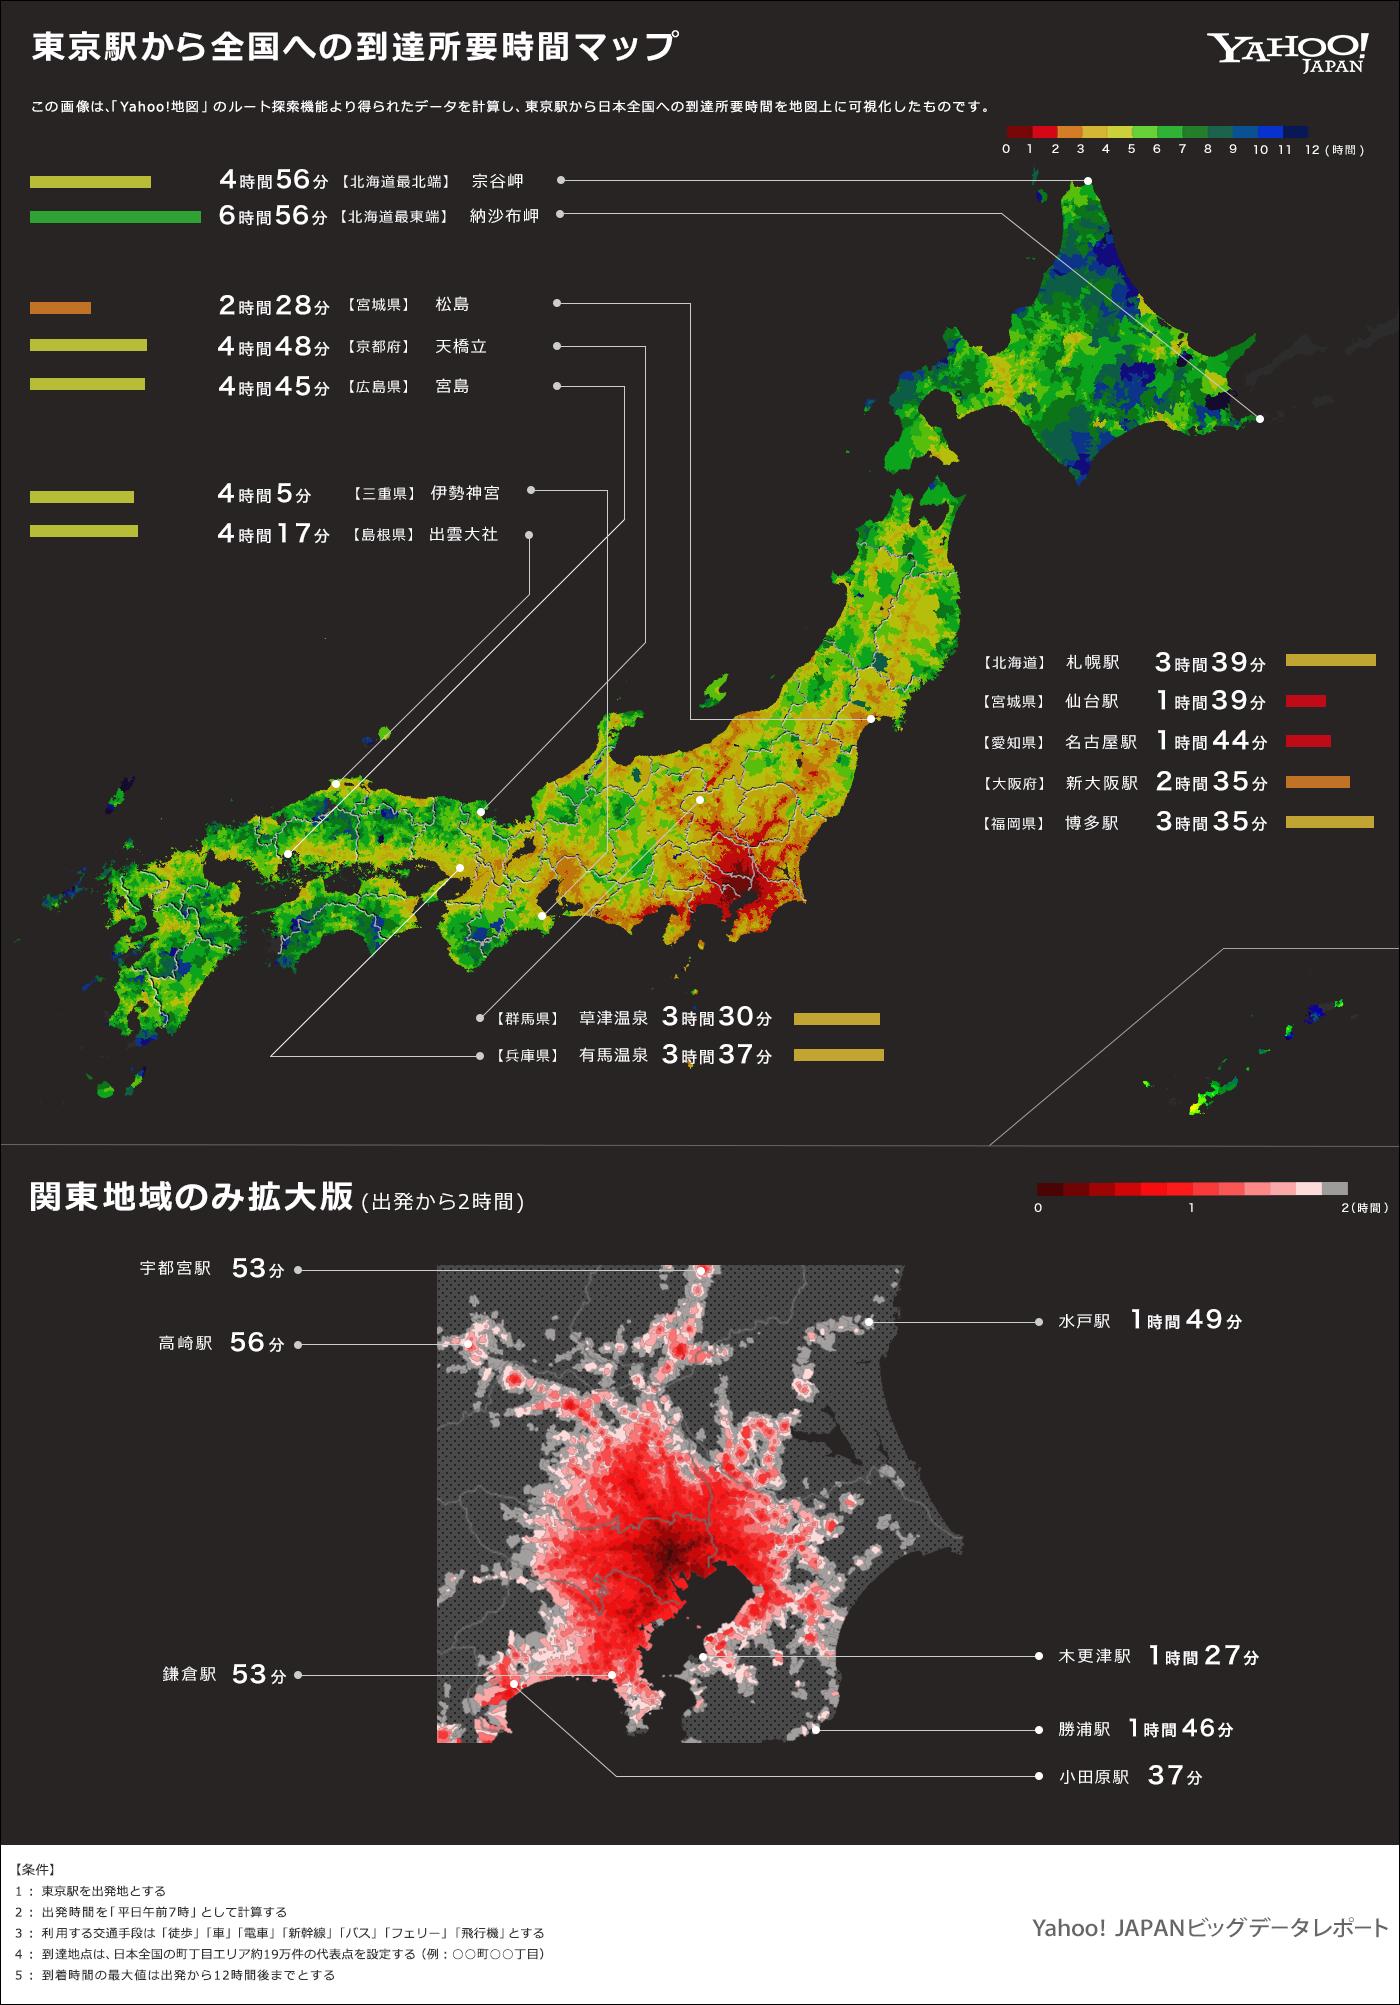 http://i.yimg.jp/i/docs/bigdata/special/2015/map_02.png